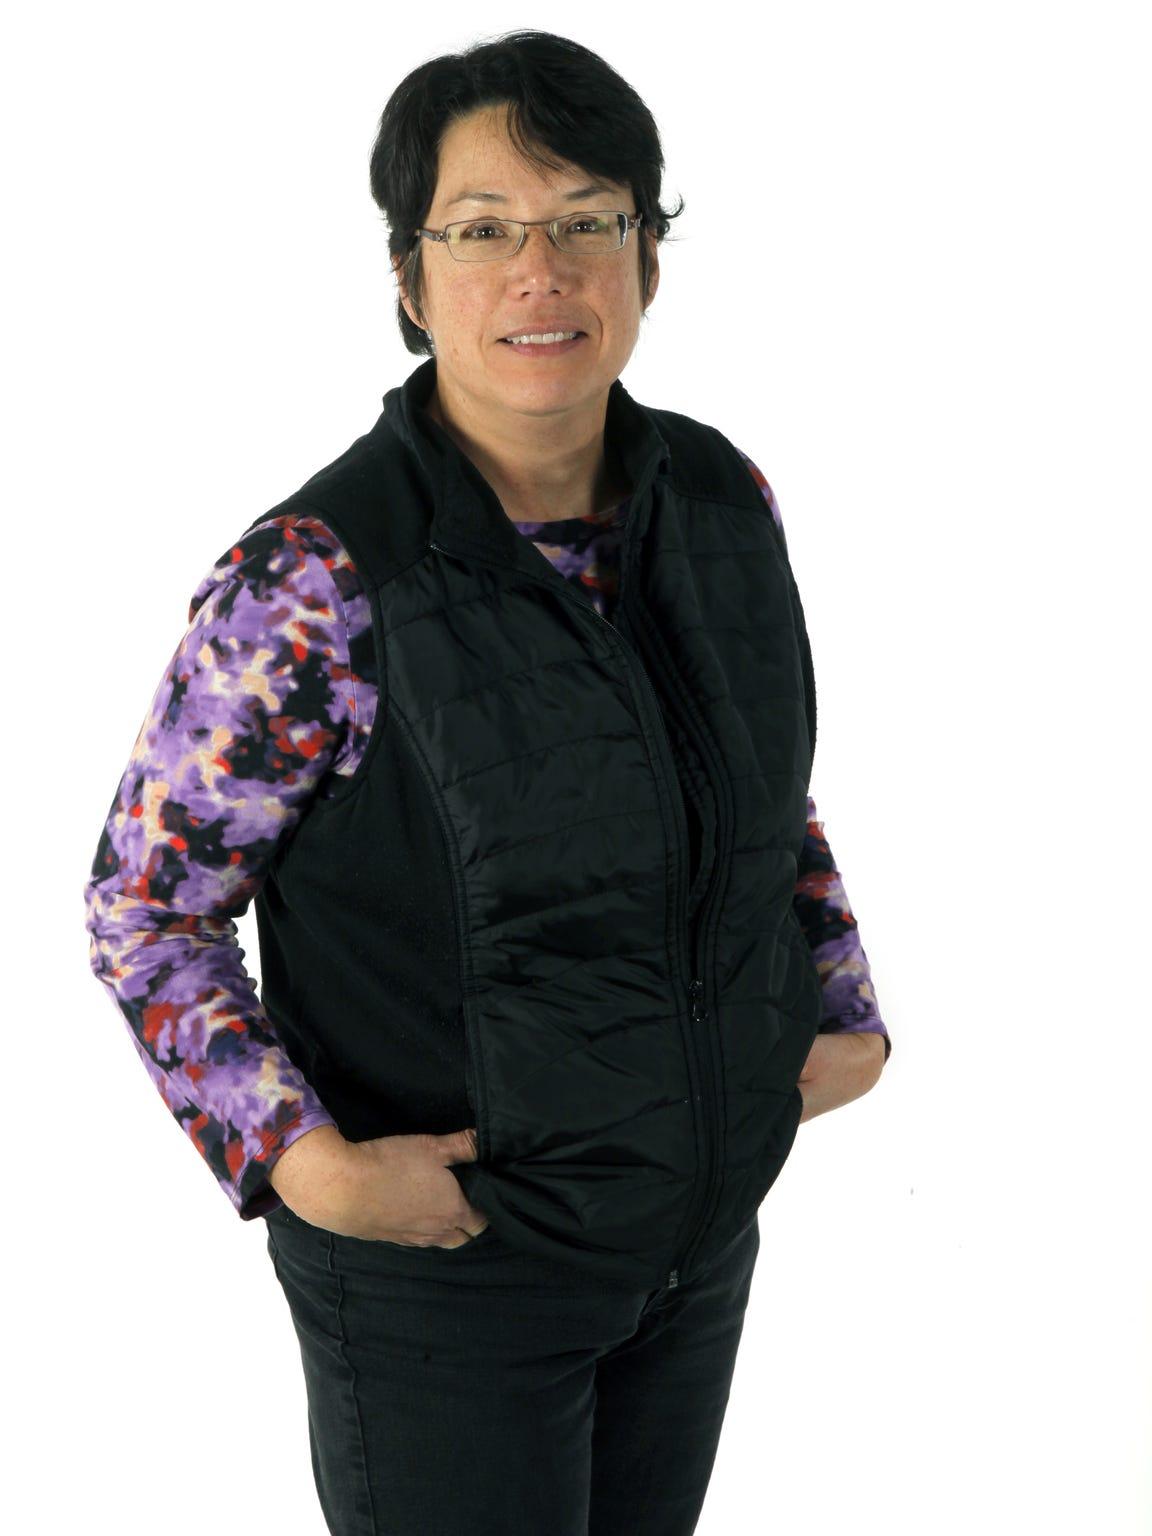 Staff photographer Tina MacIntyre-Yee